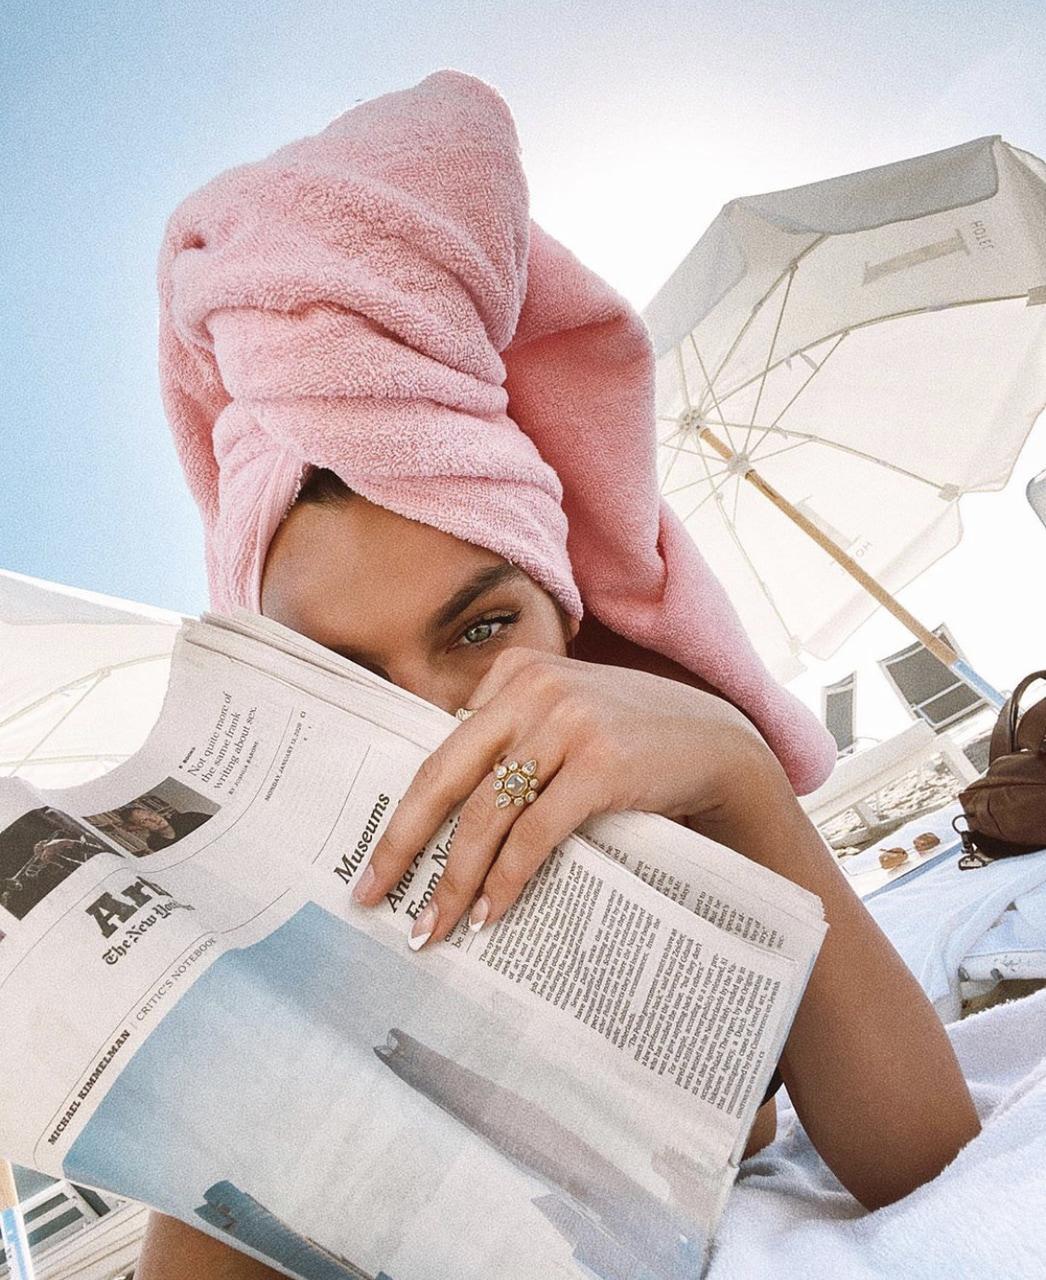 ABC, article, and Lady gaga image